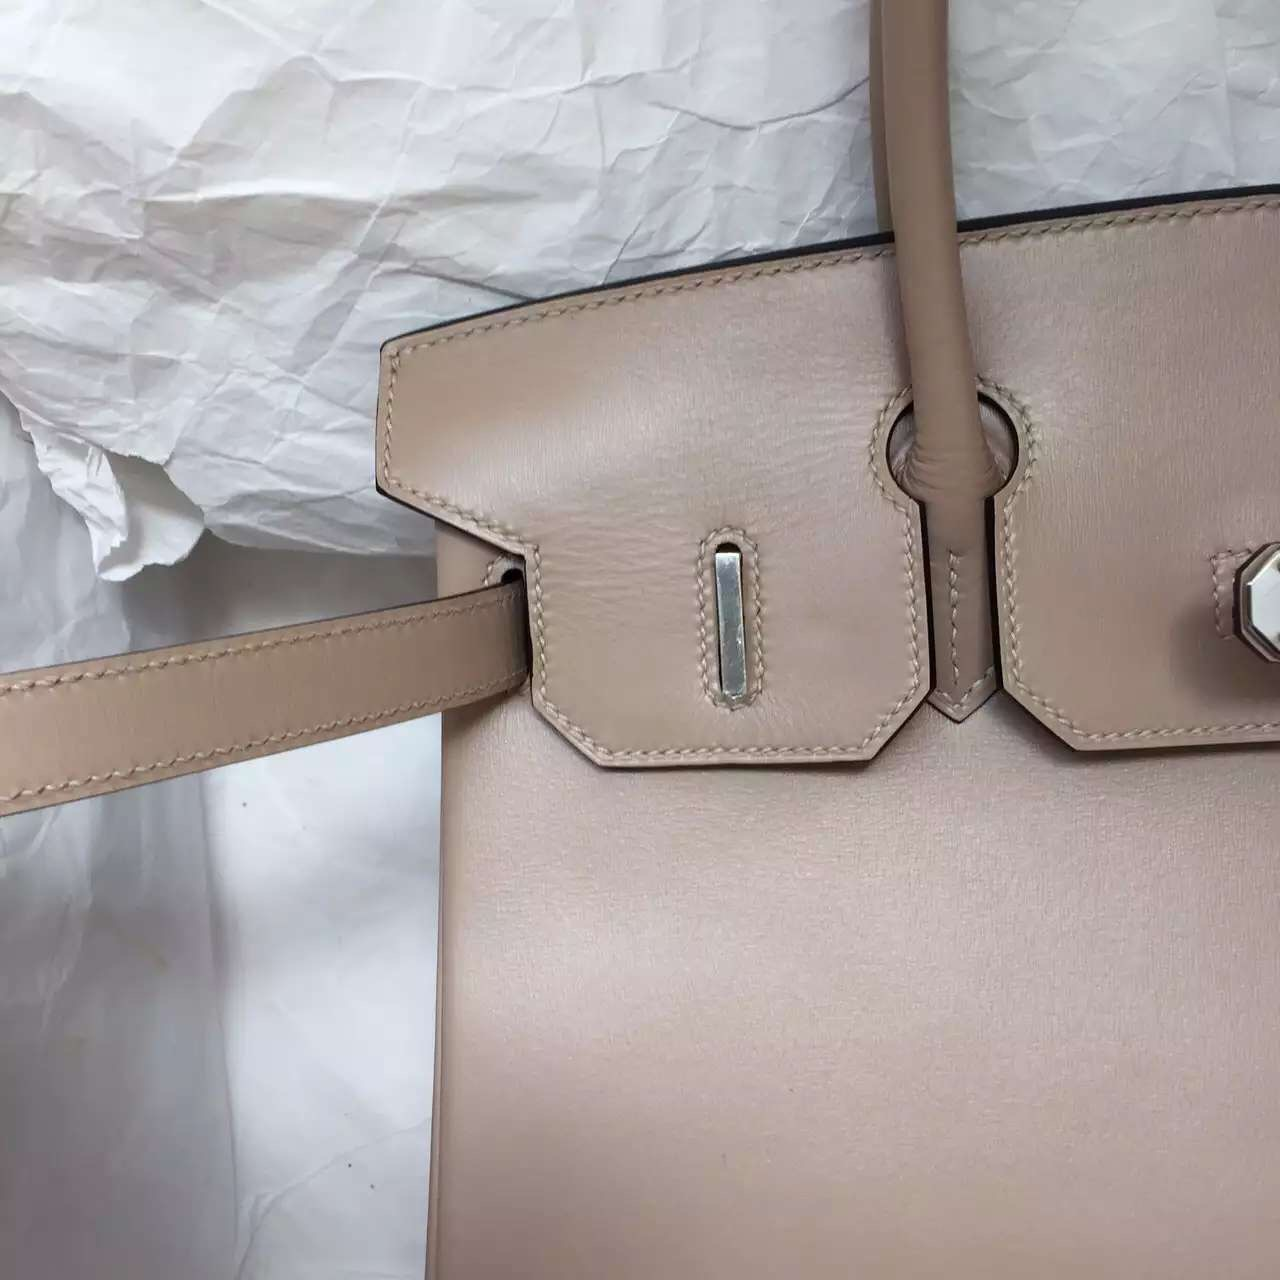 Luxury Hermes 1F Diamond Grey Box Calfskin Leather Birkin Bag 30CM Silver Hardware